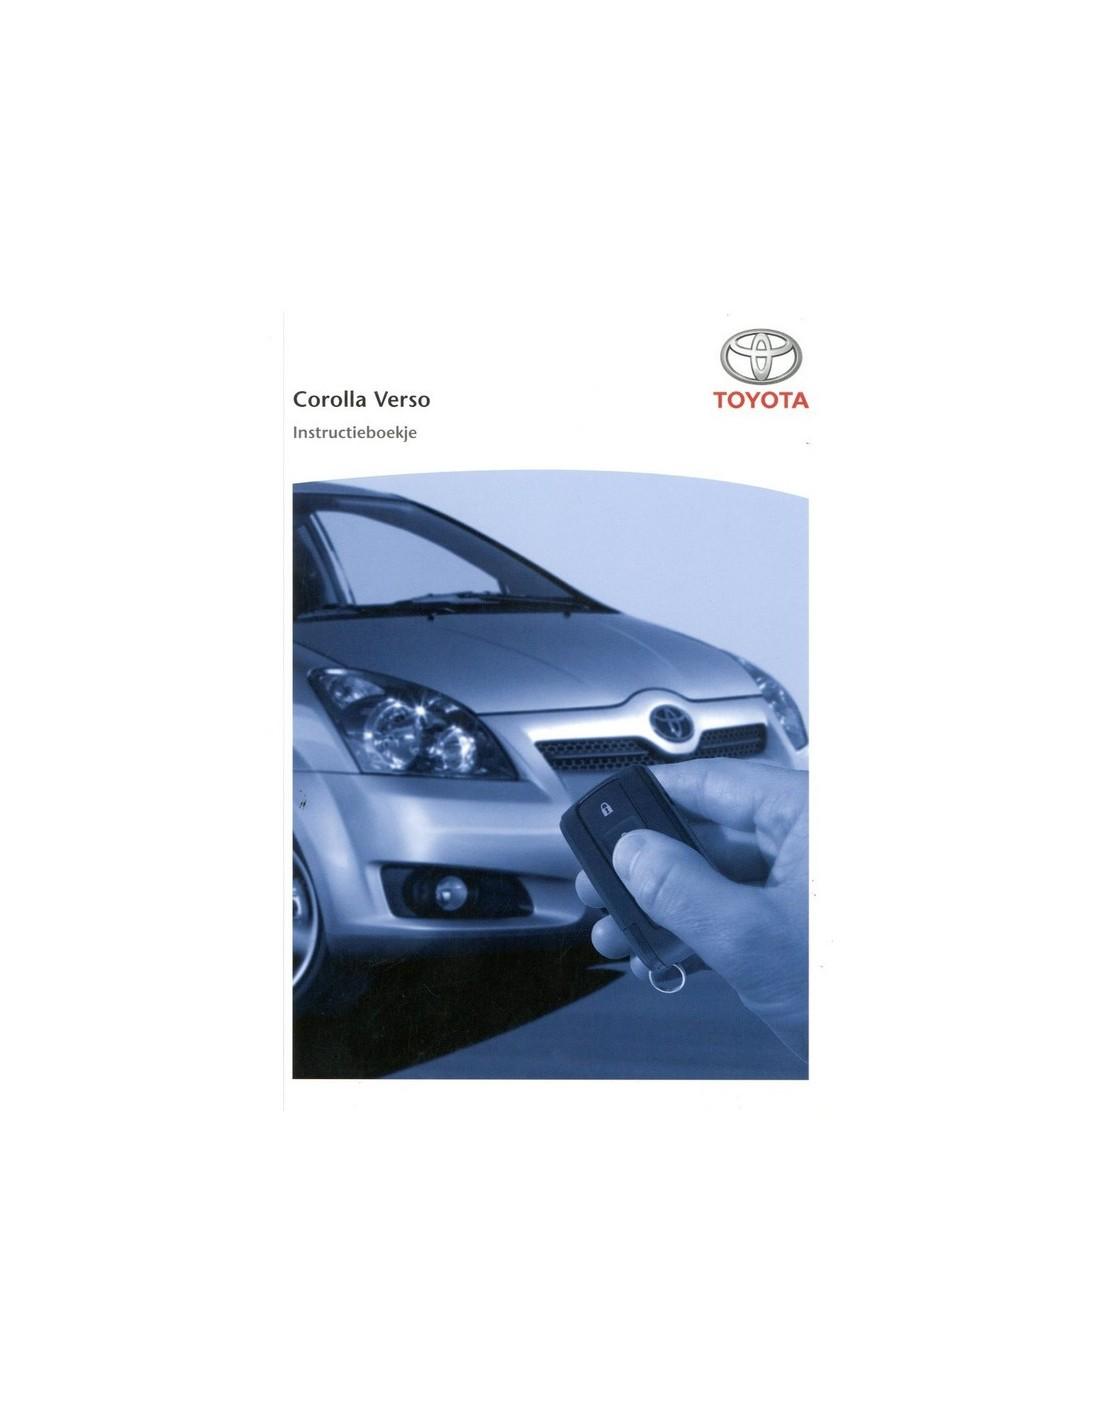 2007 toyota corolla verso owner s manual dutch rh autolit eu toyota corolla verso service manual pdf corolla verso owners manual pdf